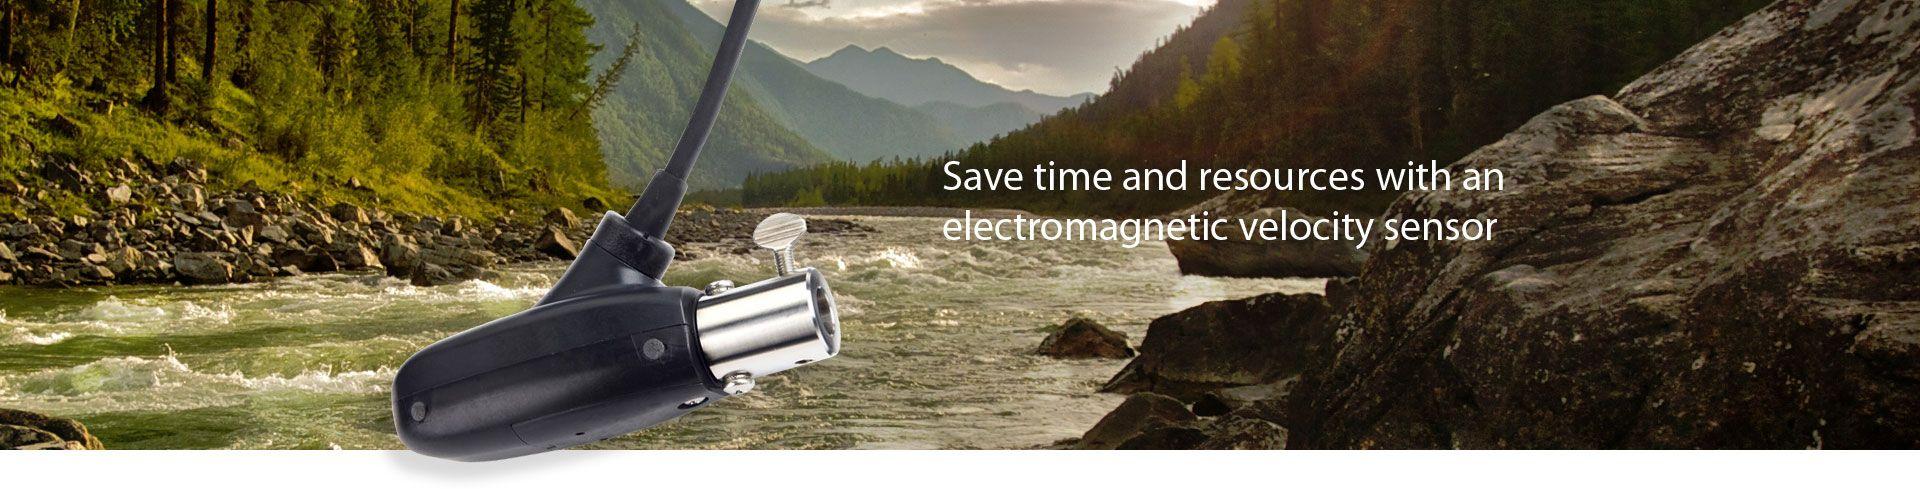 OTT MF pro Velocity & Depth Sensors